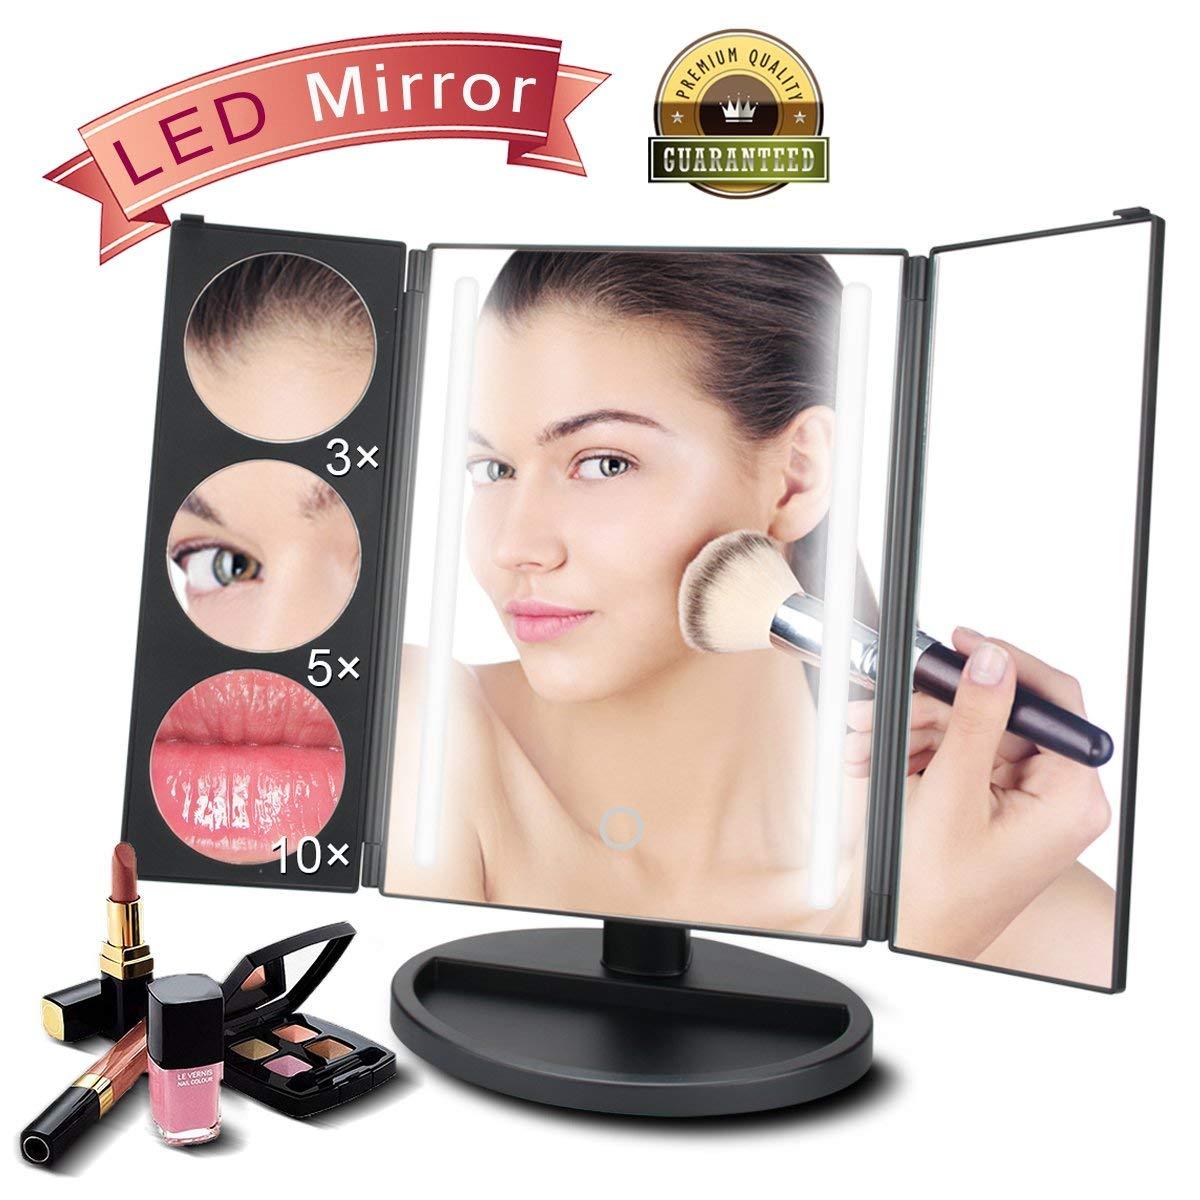 Cheap Remington Makeup Mirror Find Remington Makeup Mirror Deals On